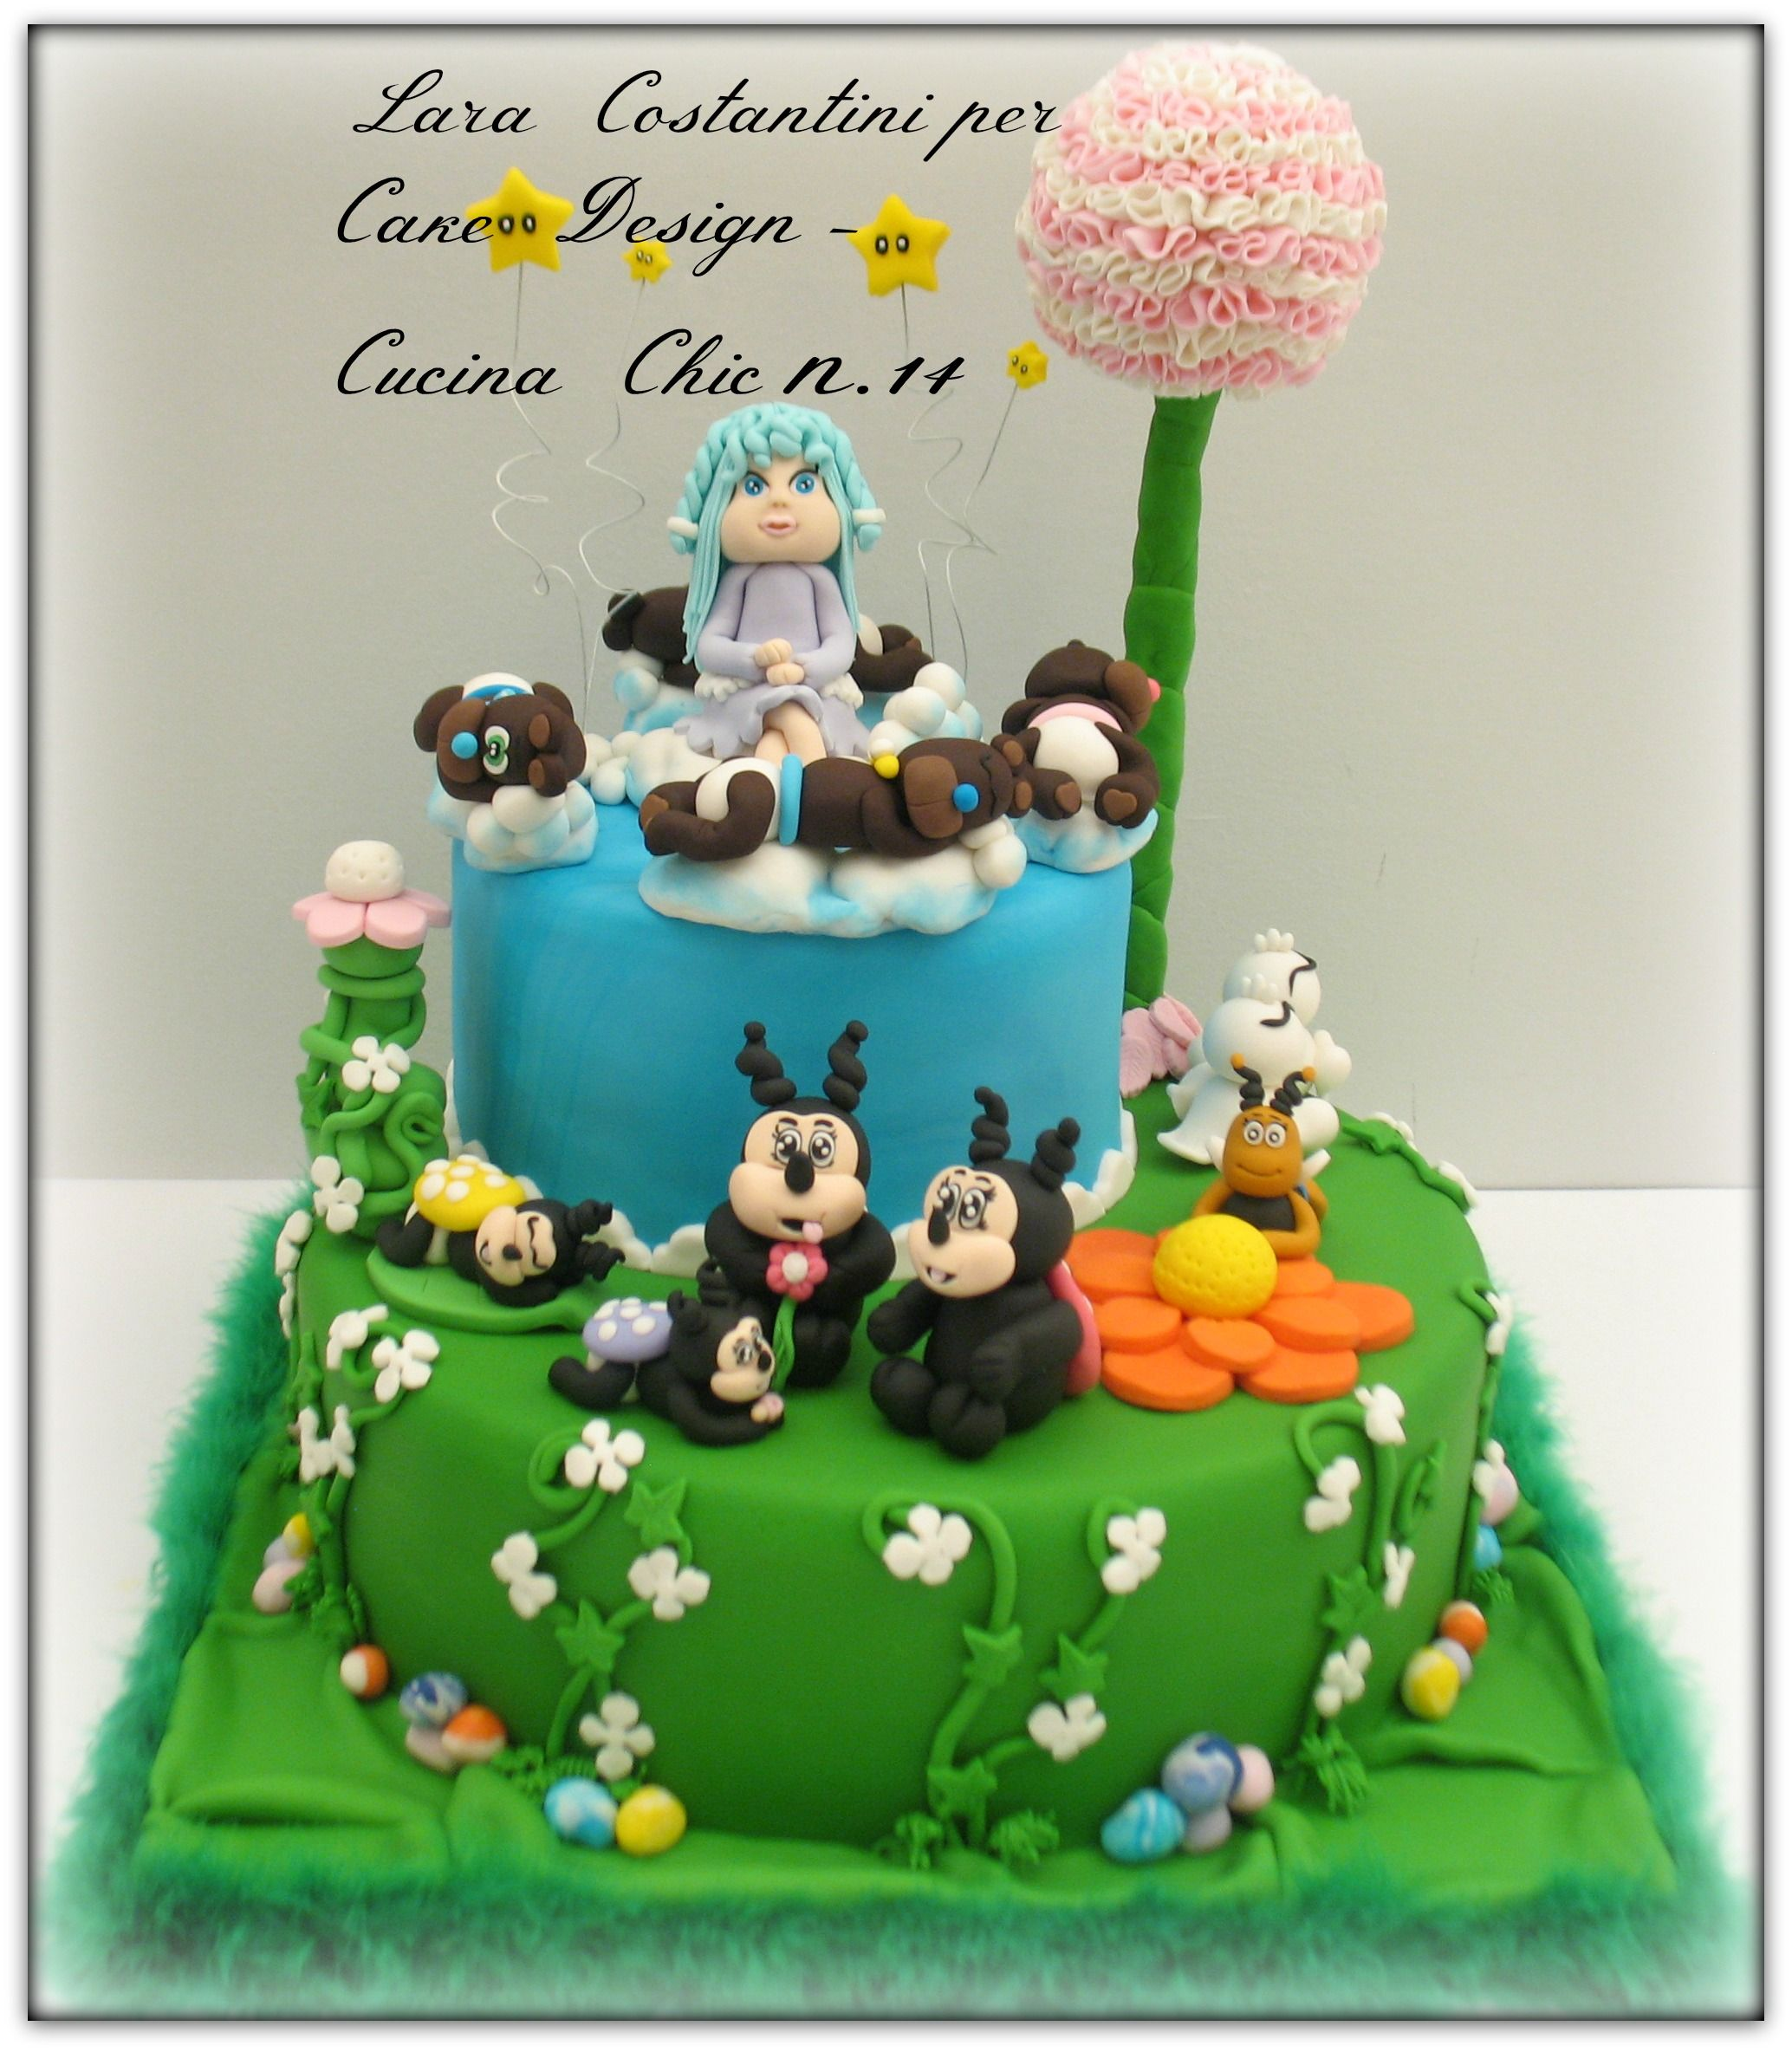 Progetto per Cake Design - Cucina Chic n. 14 | Lara Costantini Cake ...